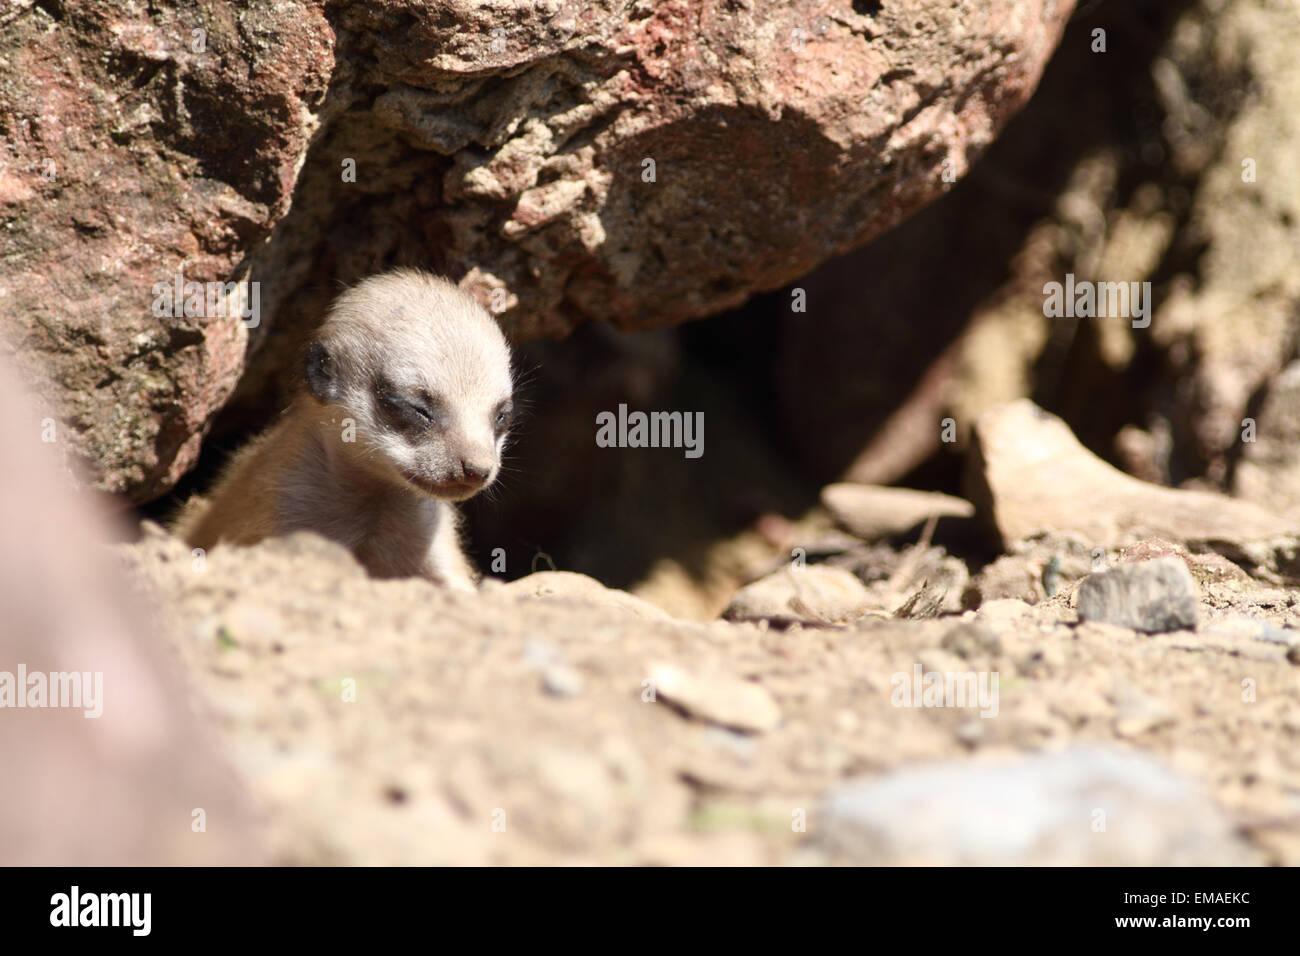 Baby Meerkat at a UK zoo. - Stock Image